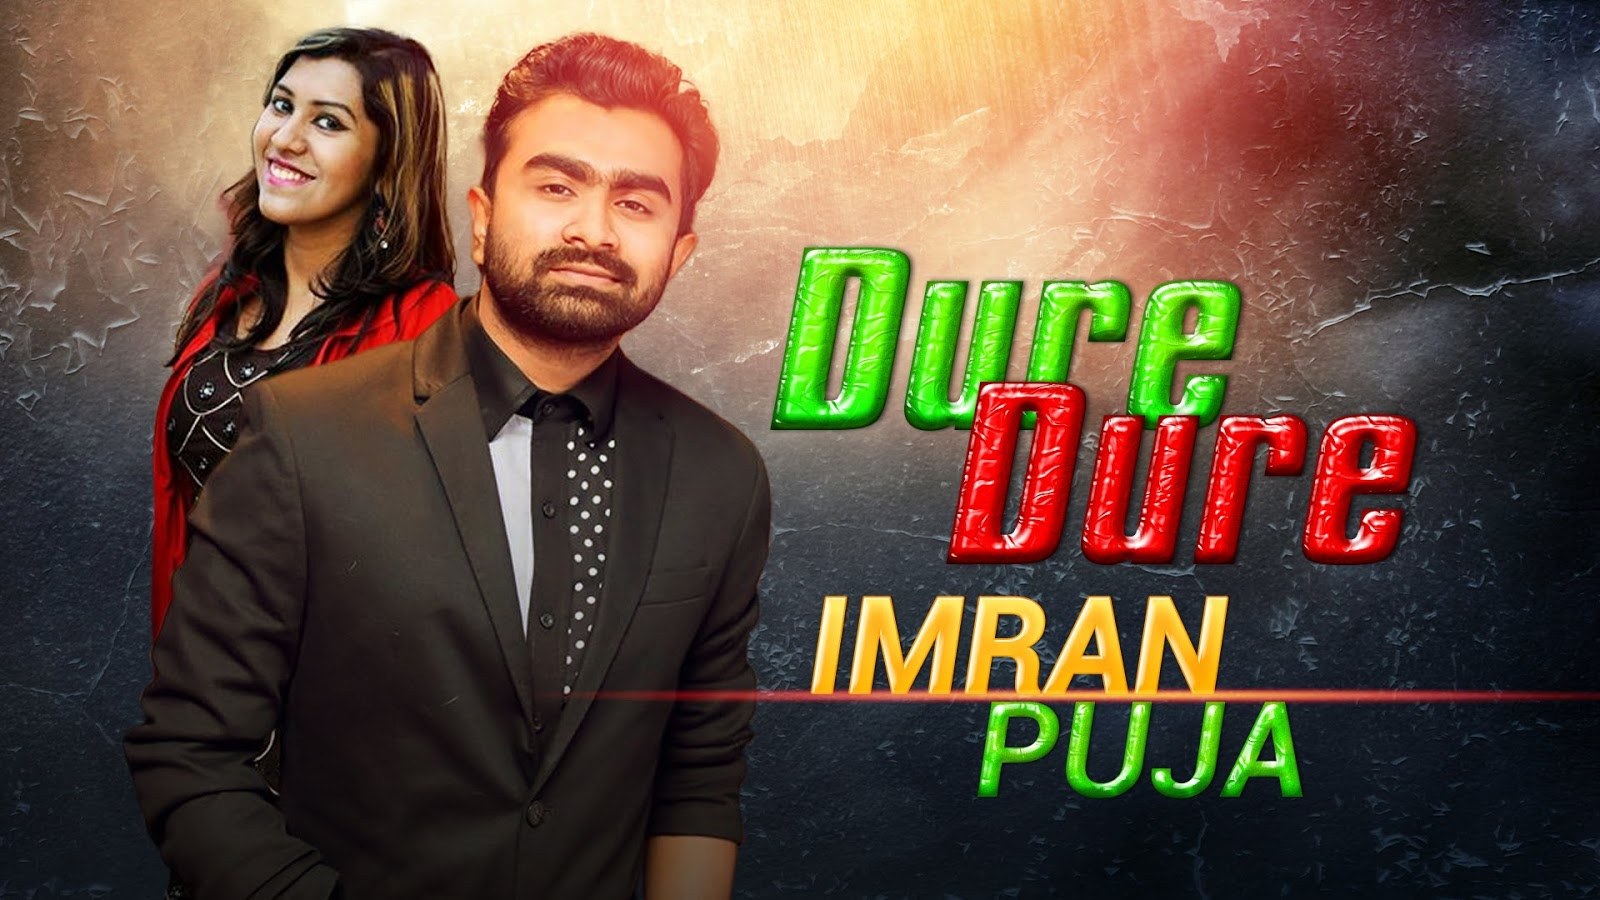 BDMusic66: Dure Dure Imran ft Puja Bangla Music Video HD